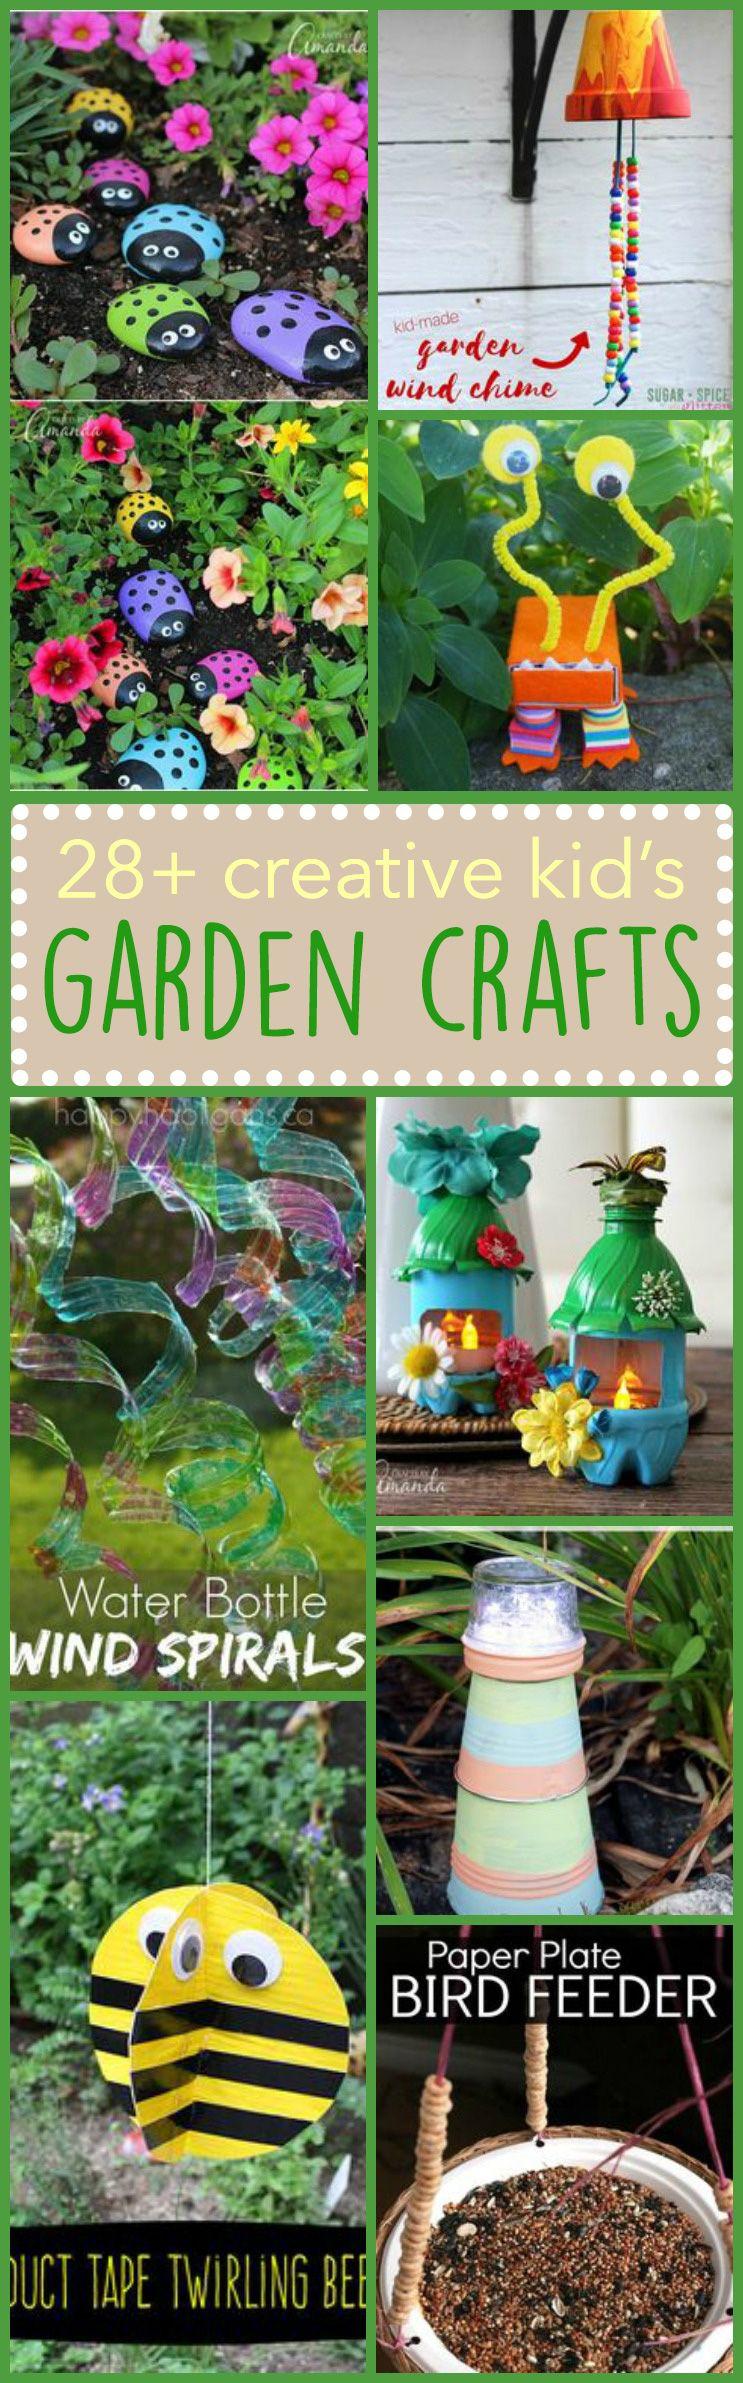 Kidu0027s Garden Crafts Weu0027ve collected simple fun